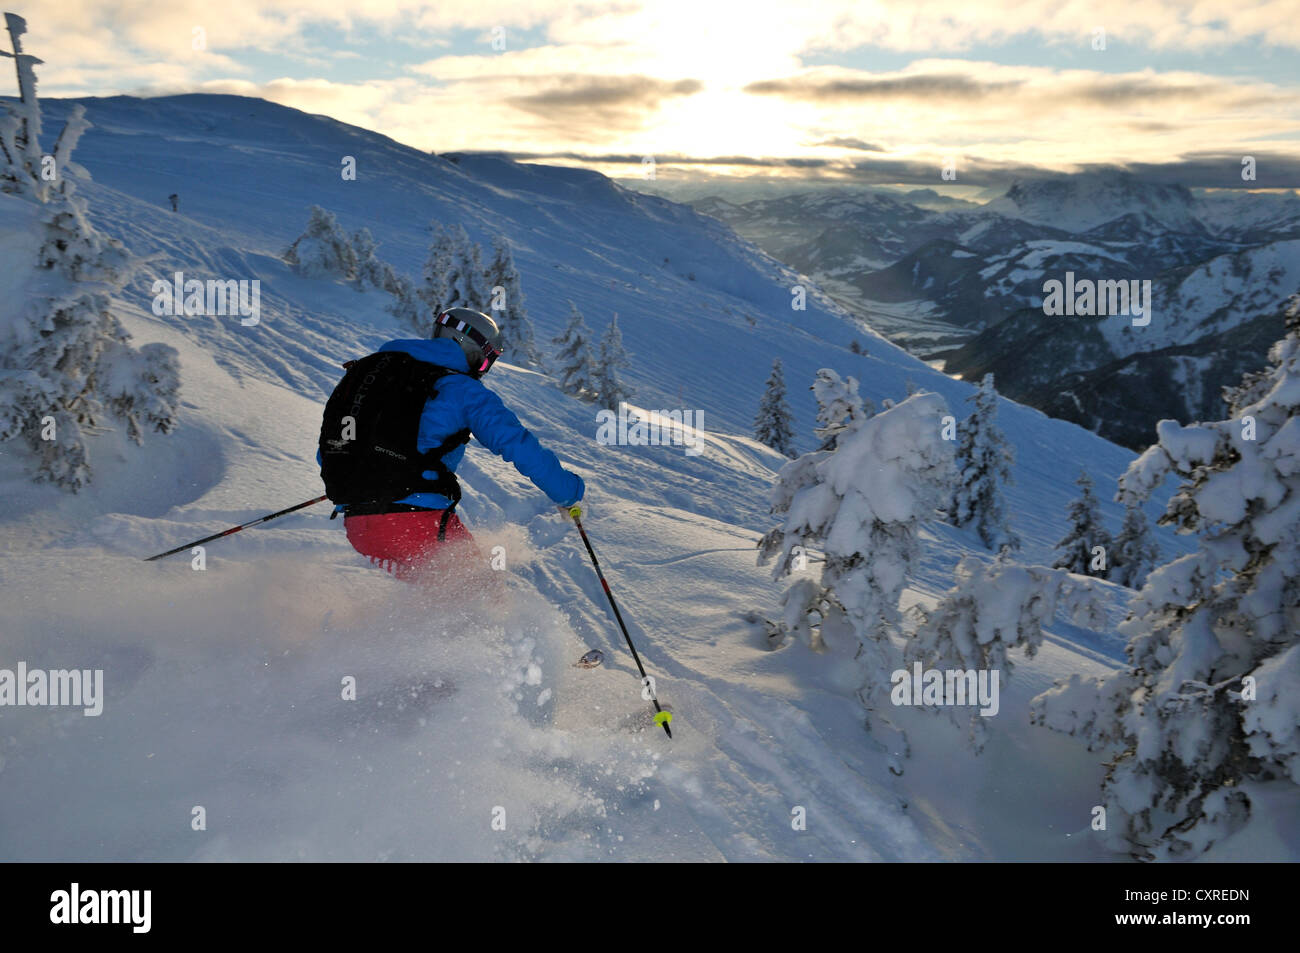 Skier downhill skiing on Steinplatte mountain, Reit im Winkl, Chiemgau, Bavaria, Germany, Europe - Stock Image